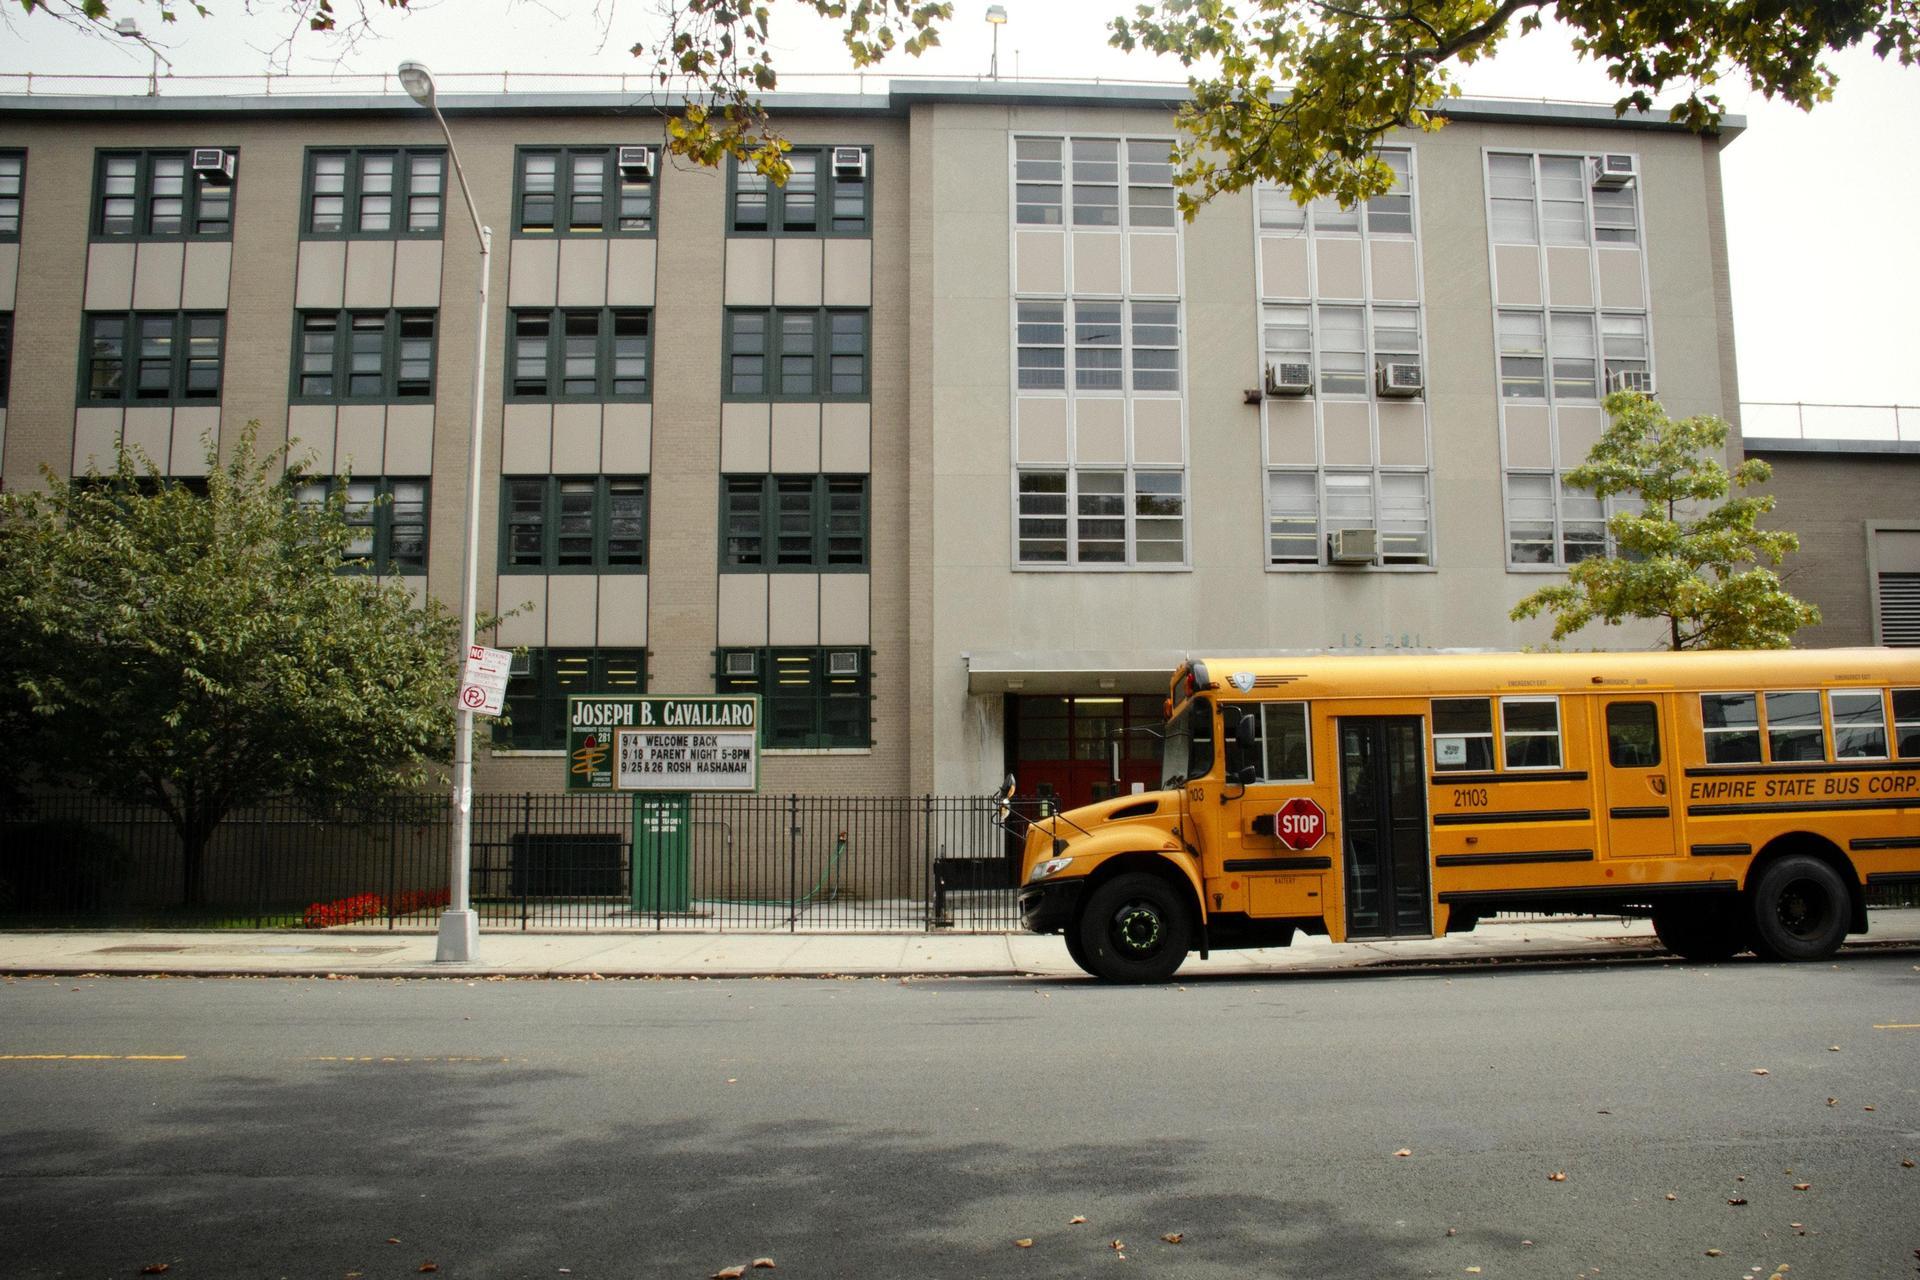 I.S. 281 Joseph B. Cavallaro Middle School